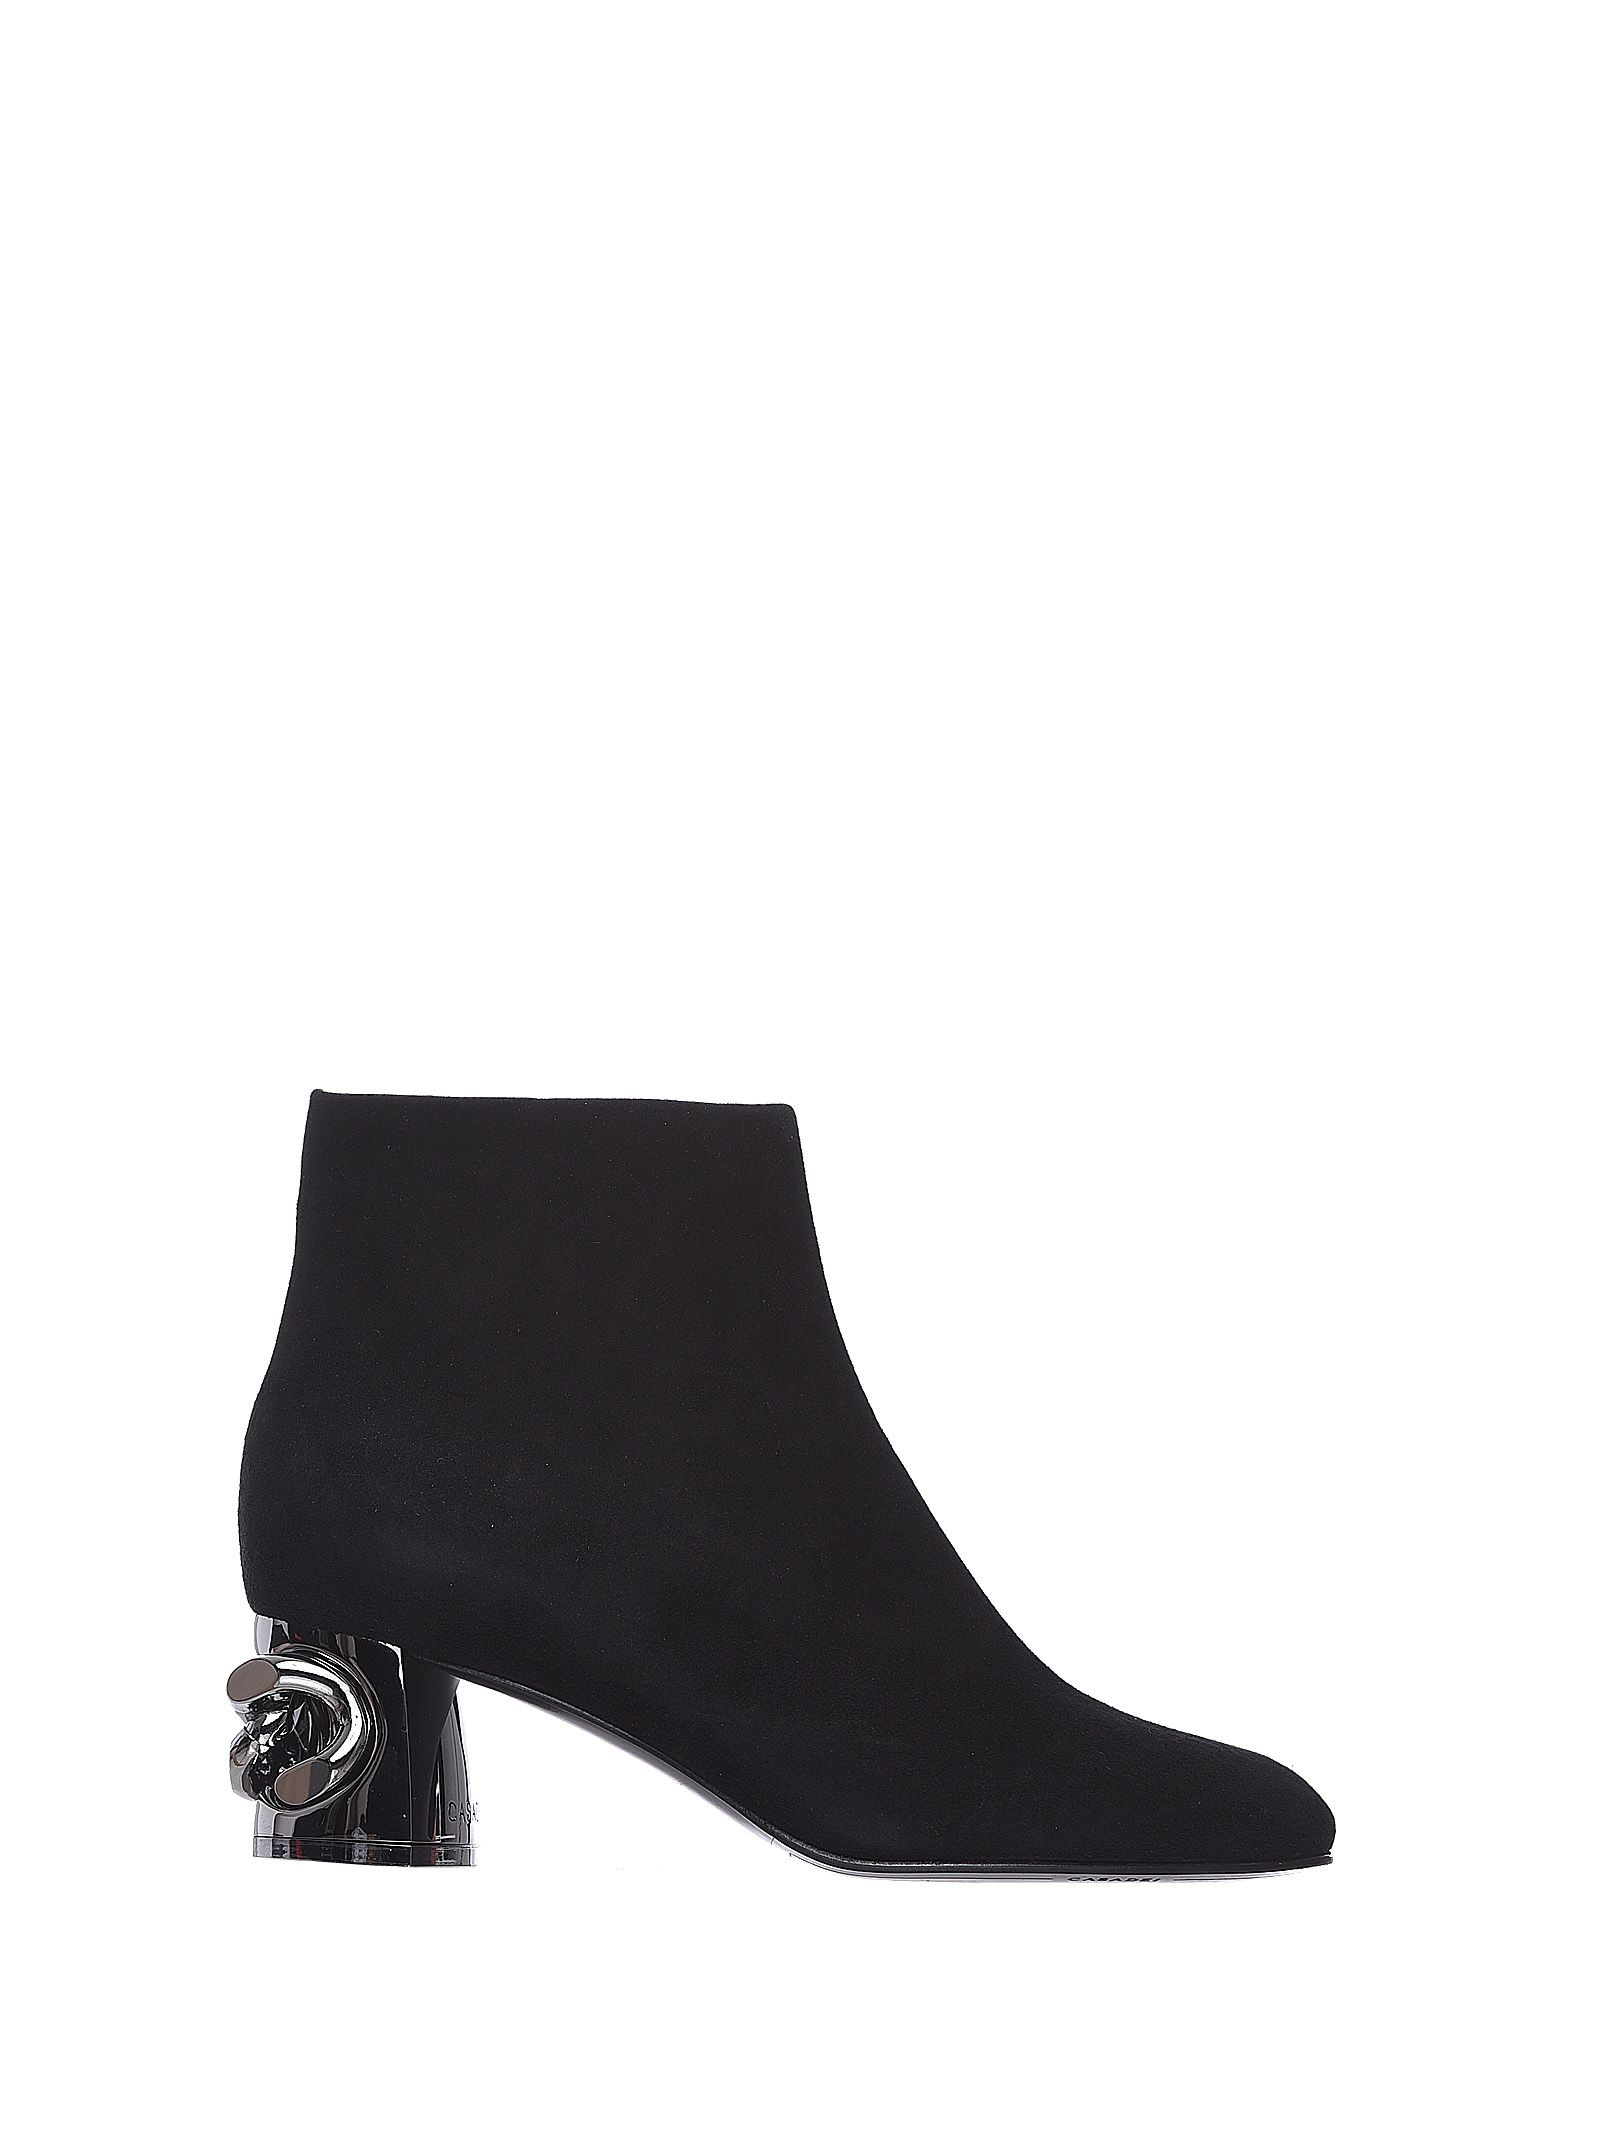 Casadei Maxi Chain Ankle Boots Black